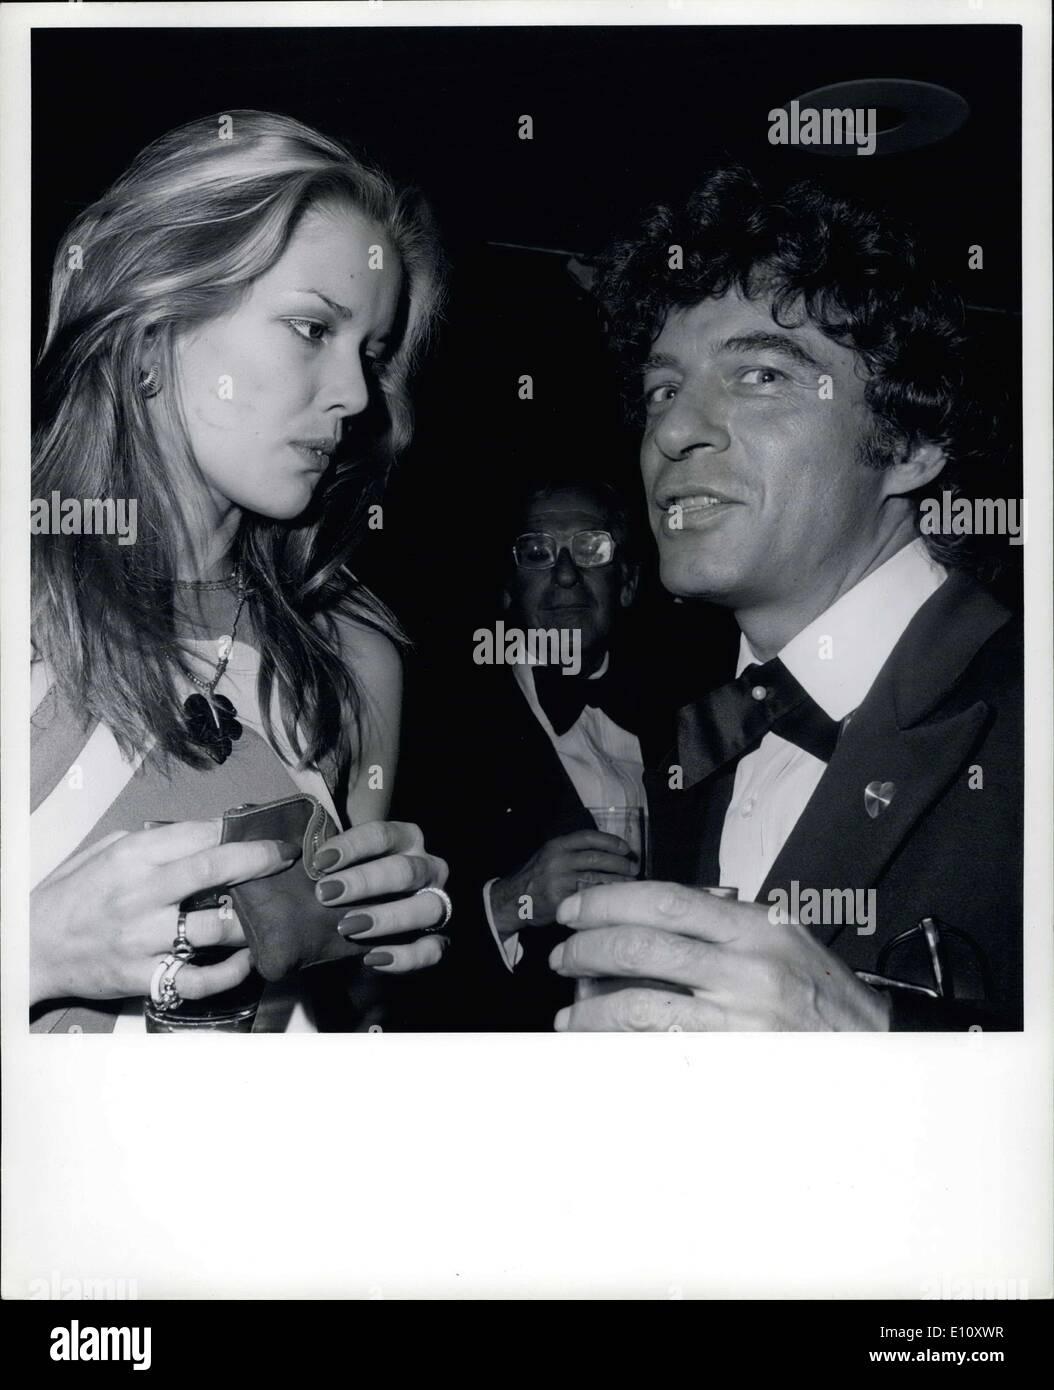 Jun. 06, 1974 - Mrs. Huntington Hartford & Jeffrey Dali Painter & nephew of Salvador Dali : Lisa Aoffman - Stock Image